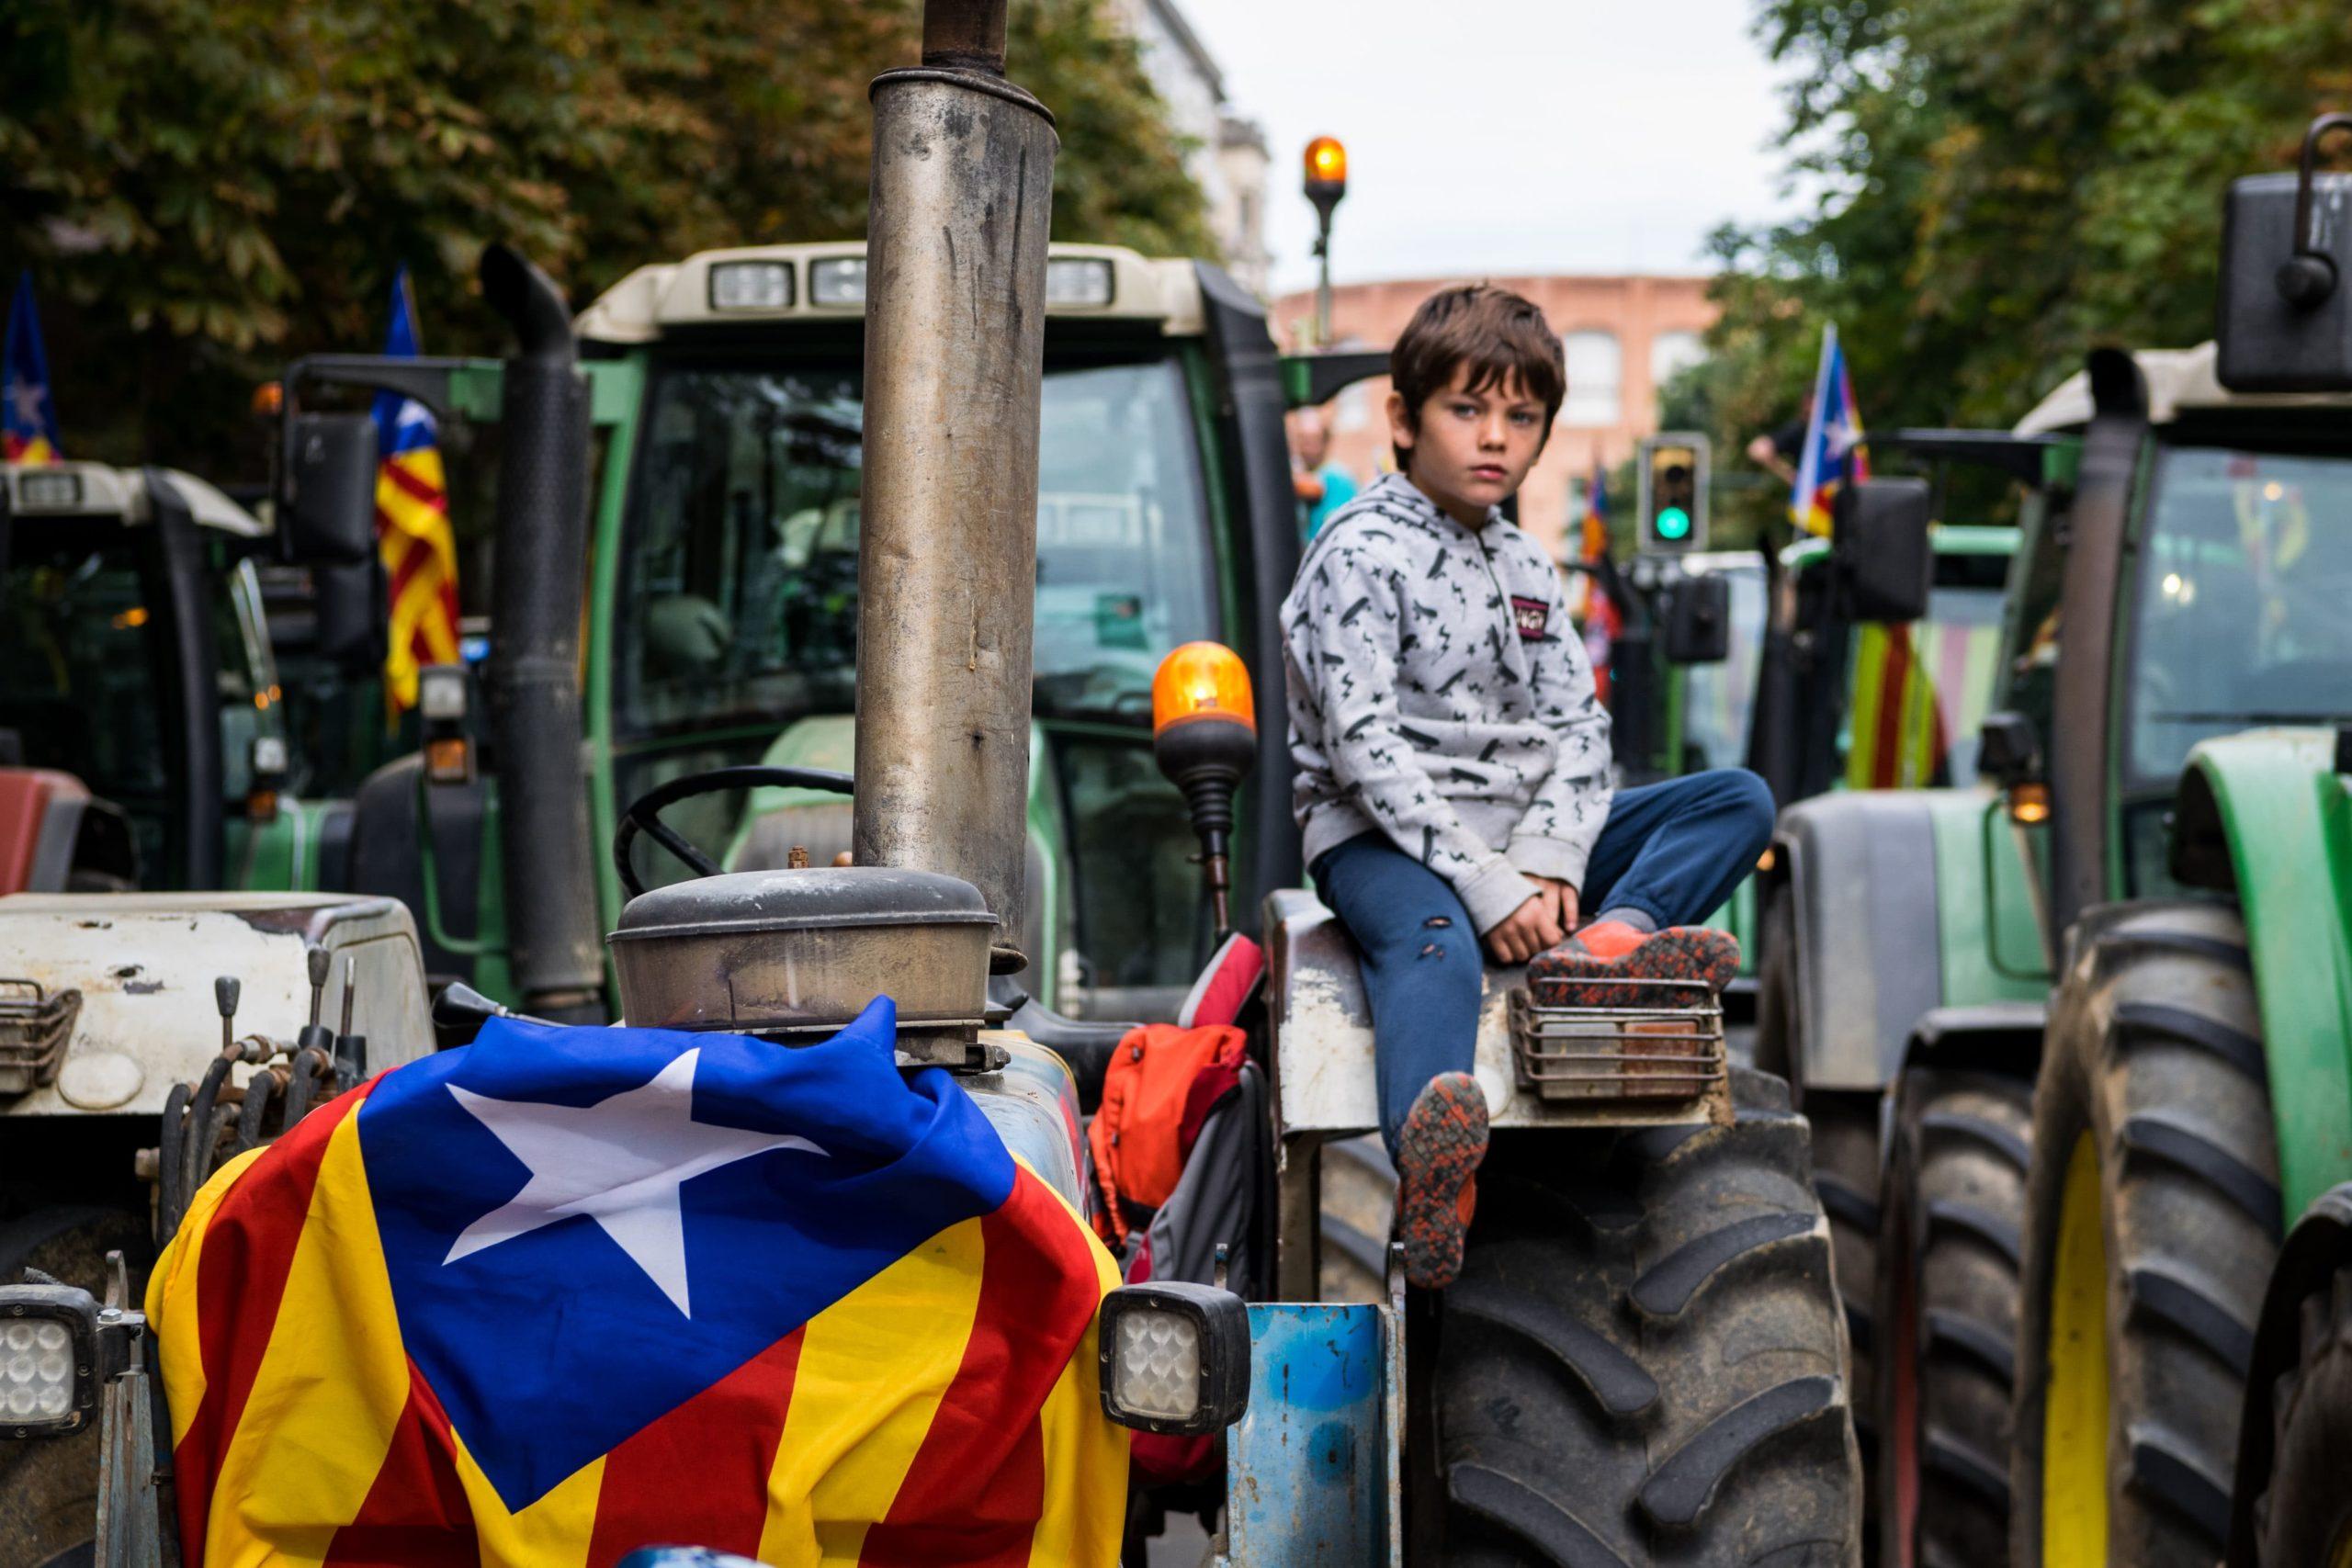 press,photo,photojournalism,riot,revolt,independence,catalan,politician,manifestation,photography